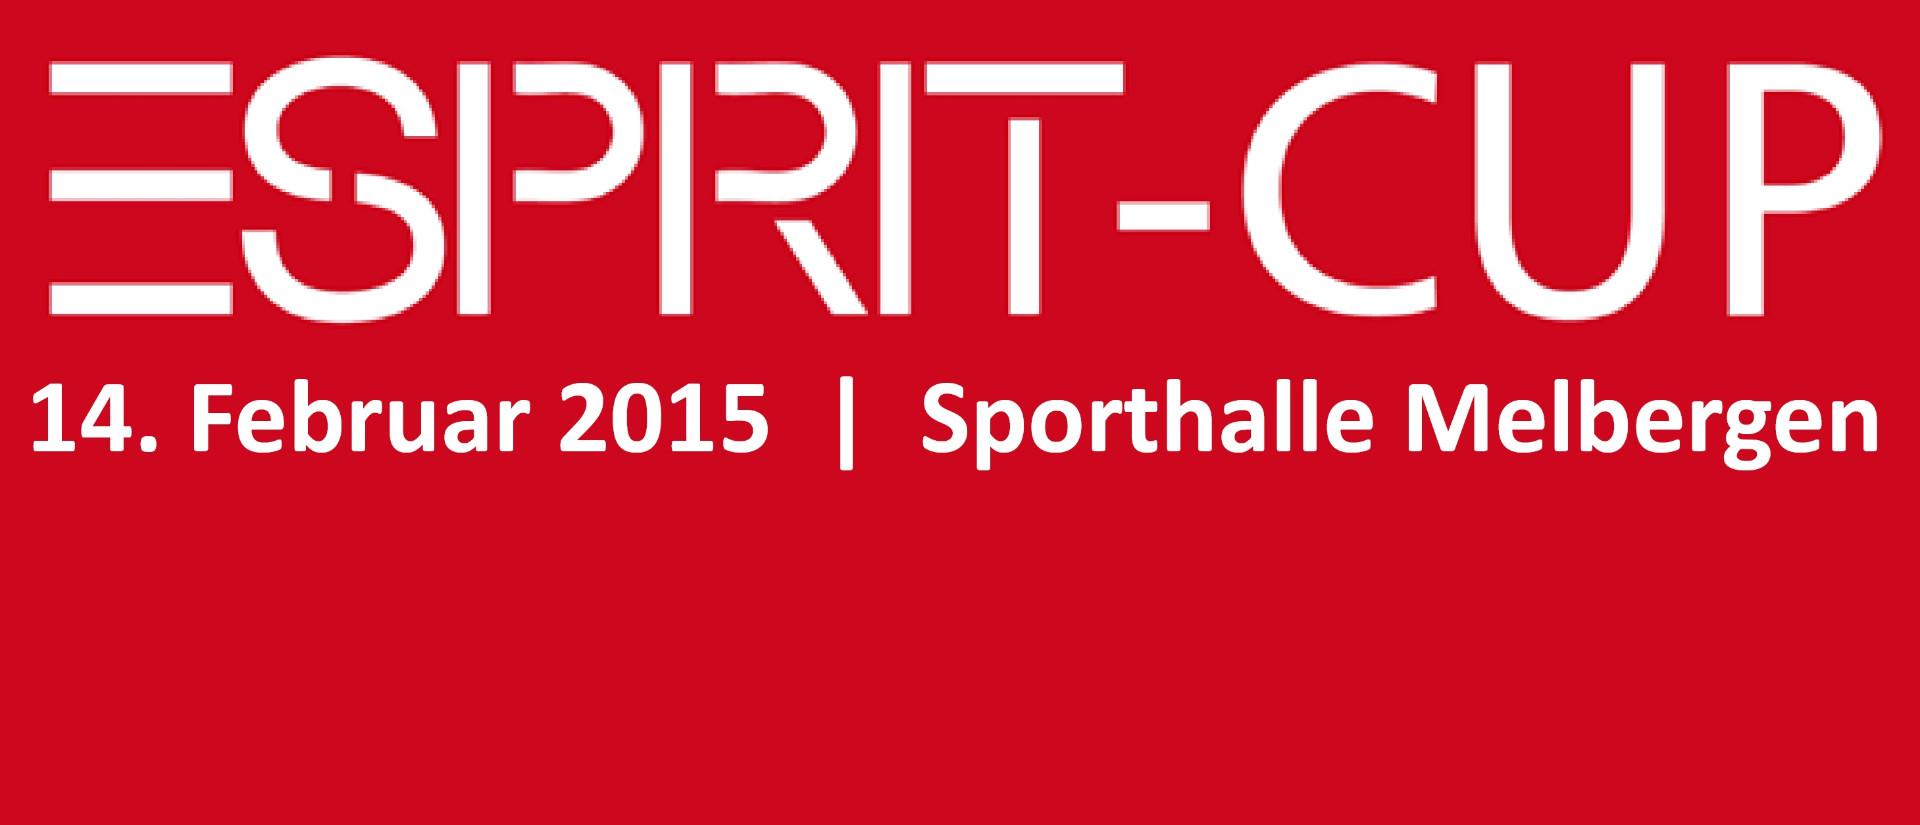 ESPRIT-Cup 2015